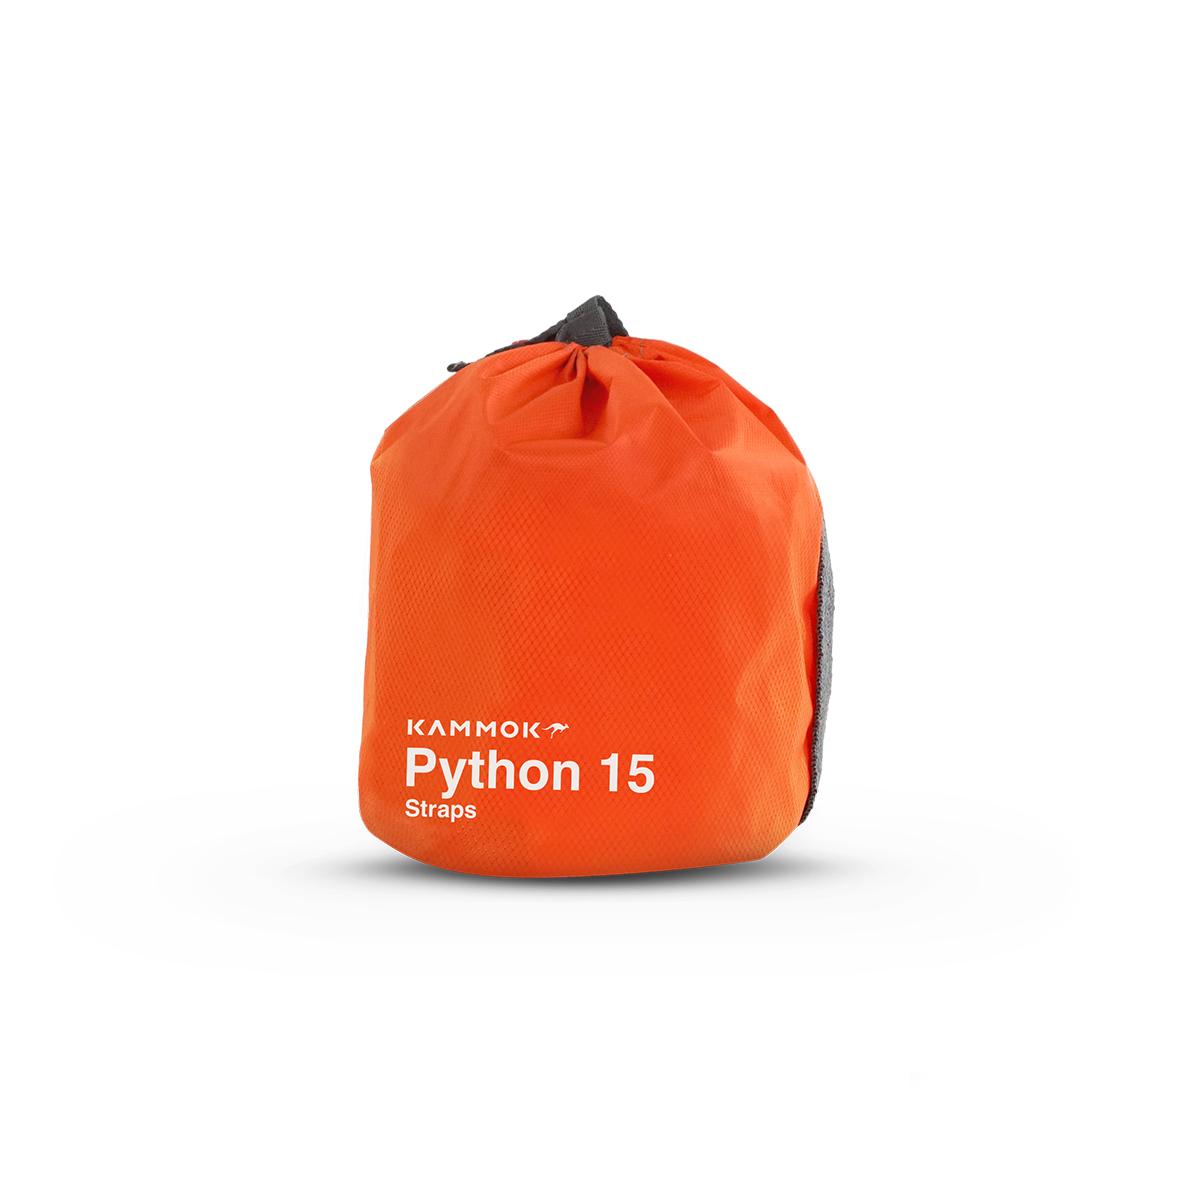 AIRMKT eCom PN XXXXXX Kammok Python15 Packed WEB